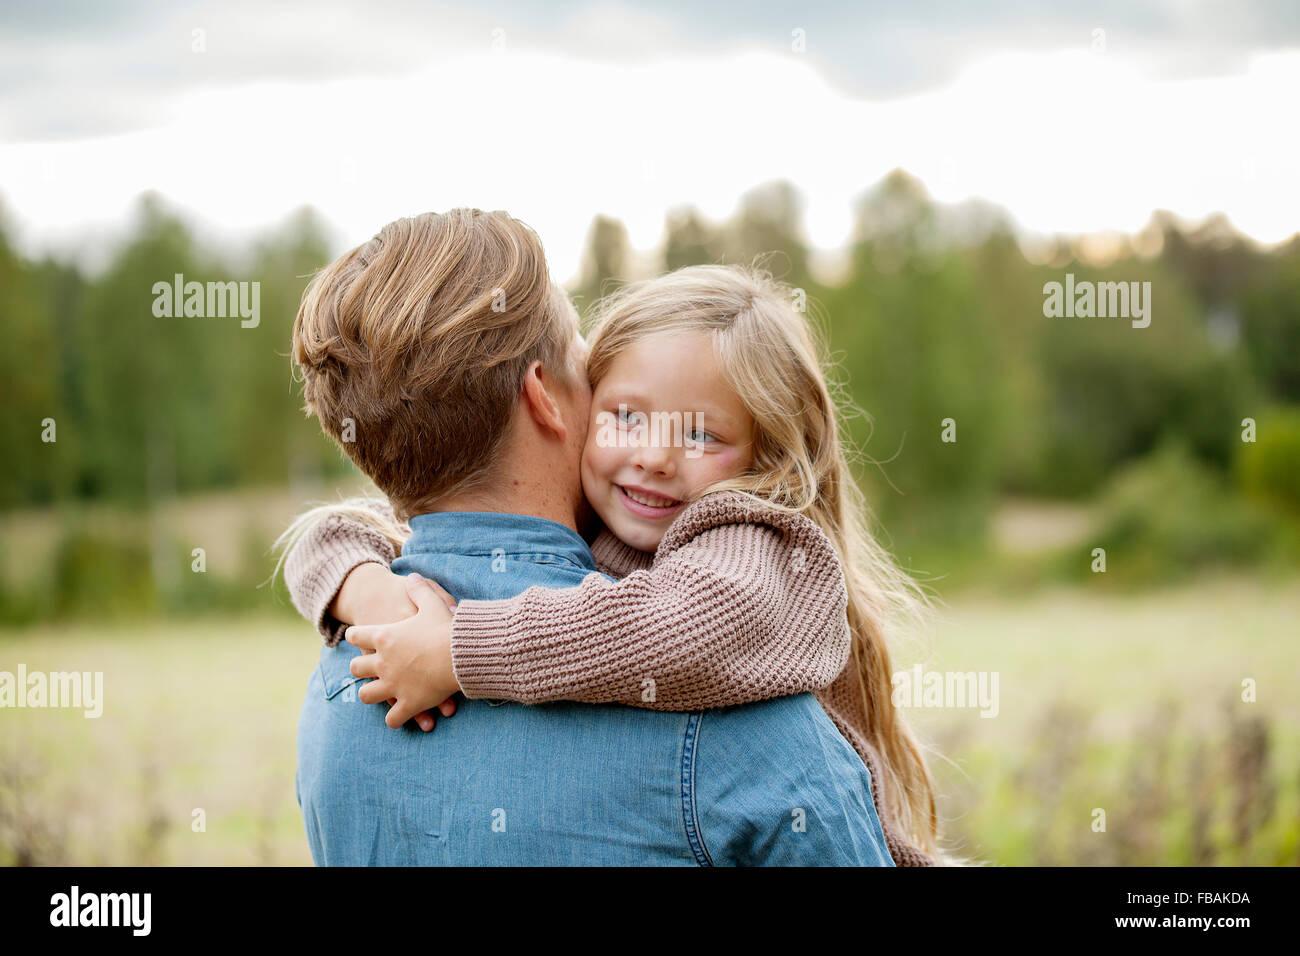 Finlandia, Uusimaa, Raasepori, Karjaa, giovane ragazza (6-7) abbraccia il suo padre Foto Stock